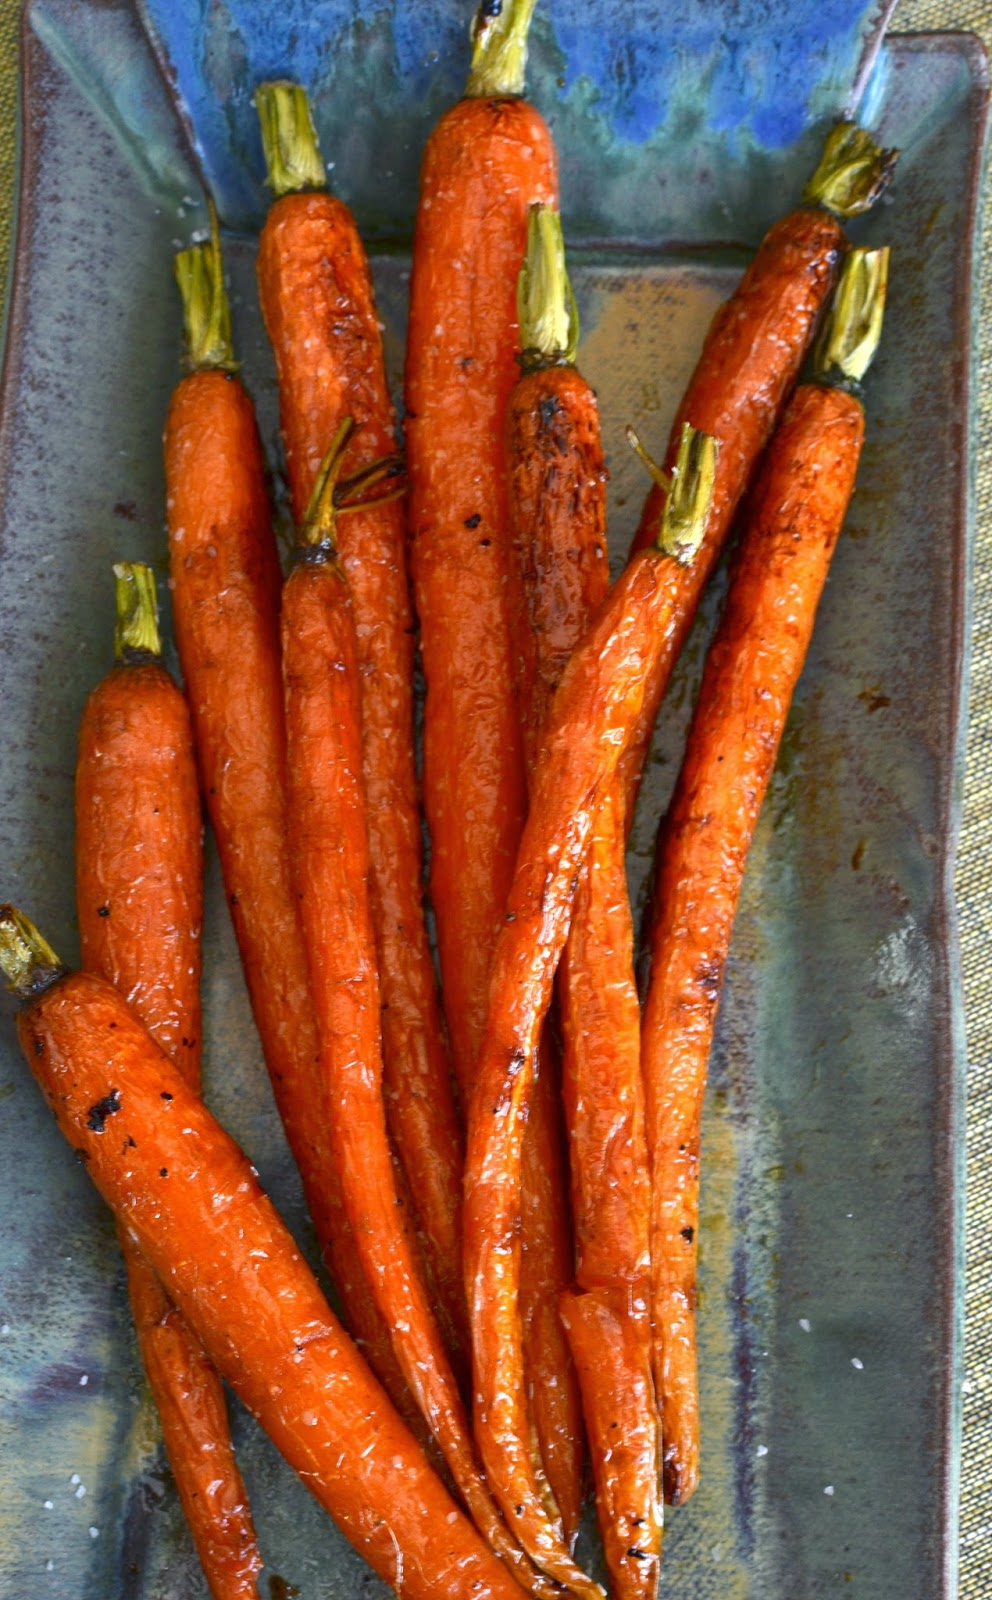 http://asouthern-soul.blogspot.com/2013/03/roasted-carrots-with-honey-lemon.html